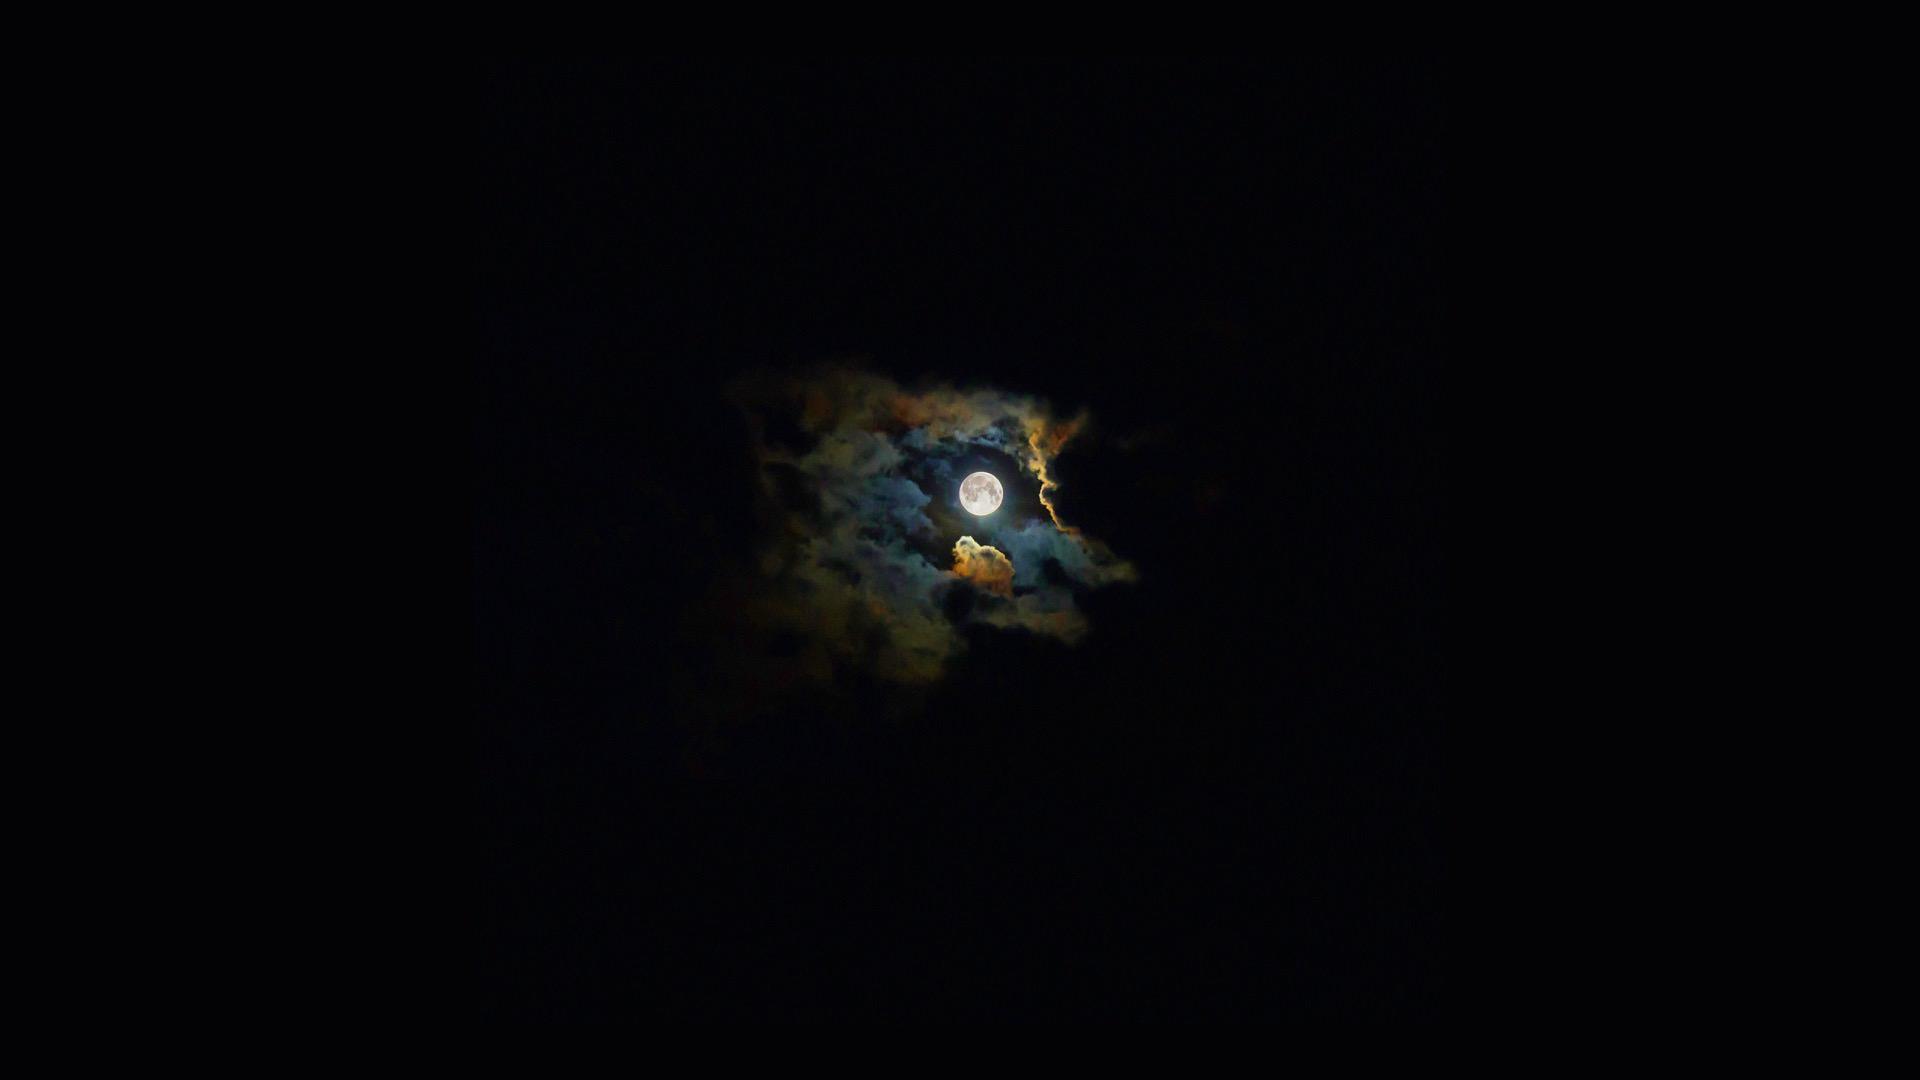 風景夜空月黒 | wallpaper.sc De...